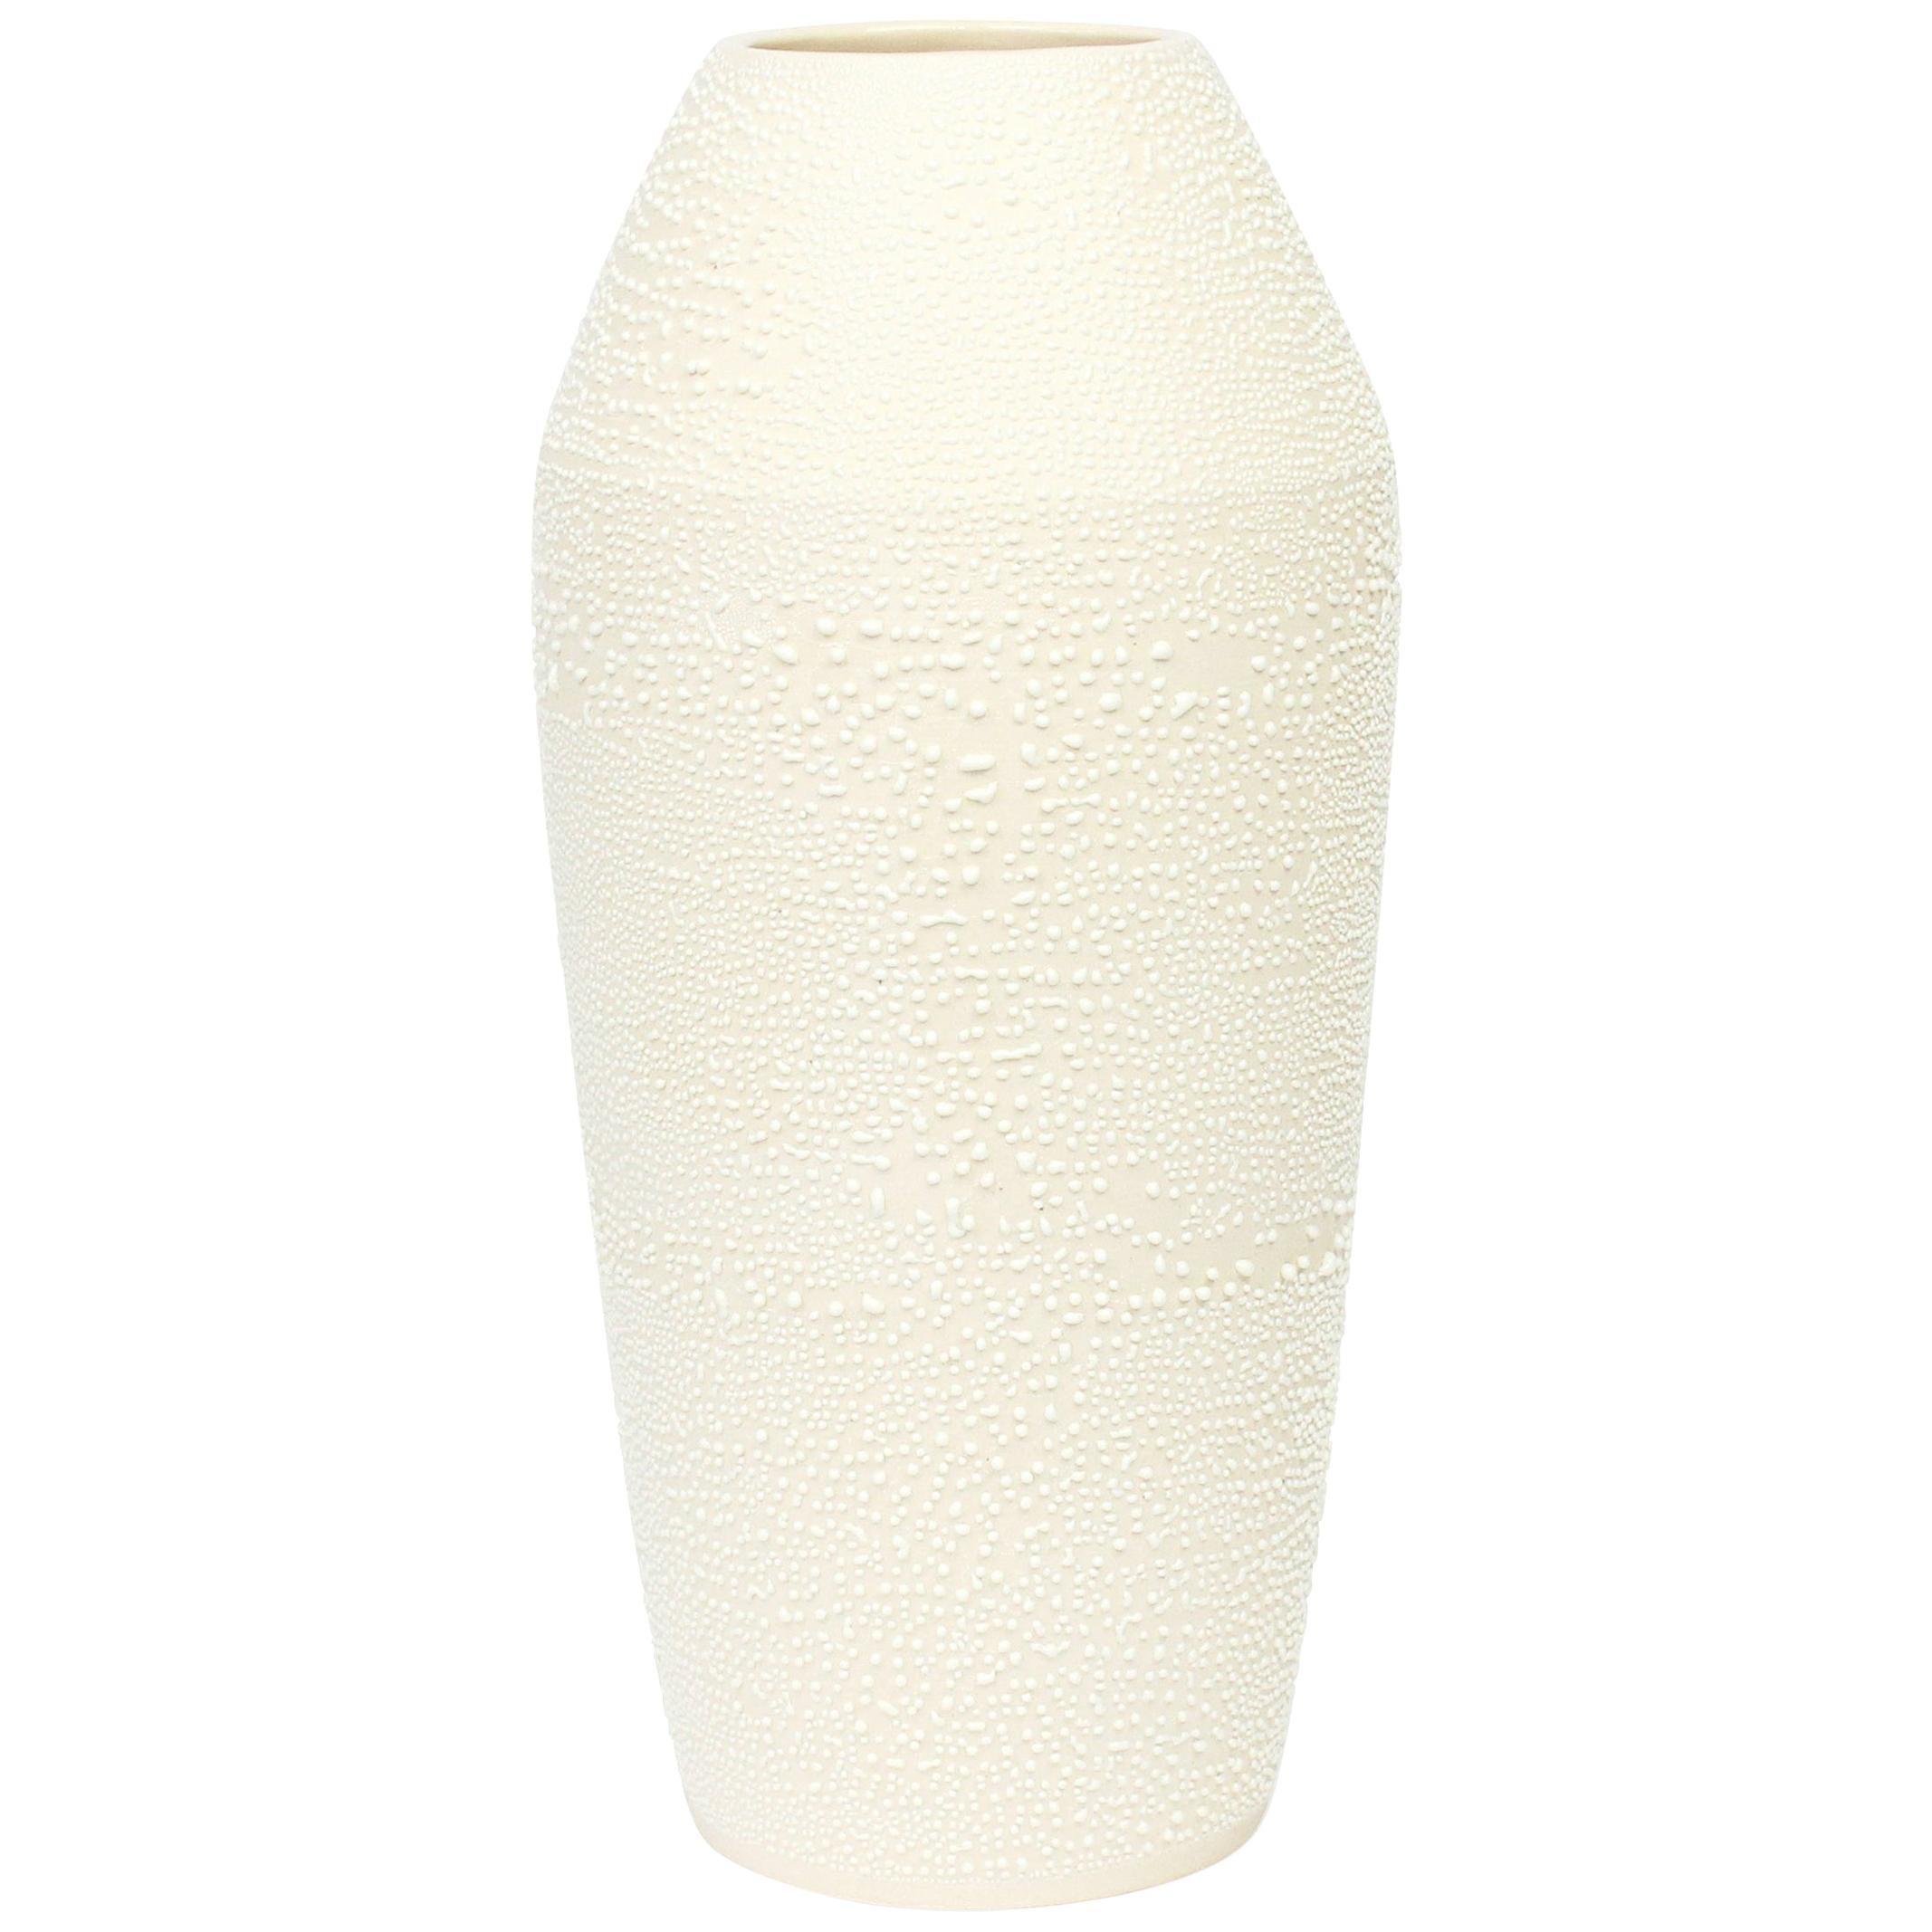 Contemporary Large Dew Vase #1 White Ceramic and Glaze, Handmade